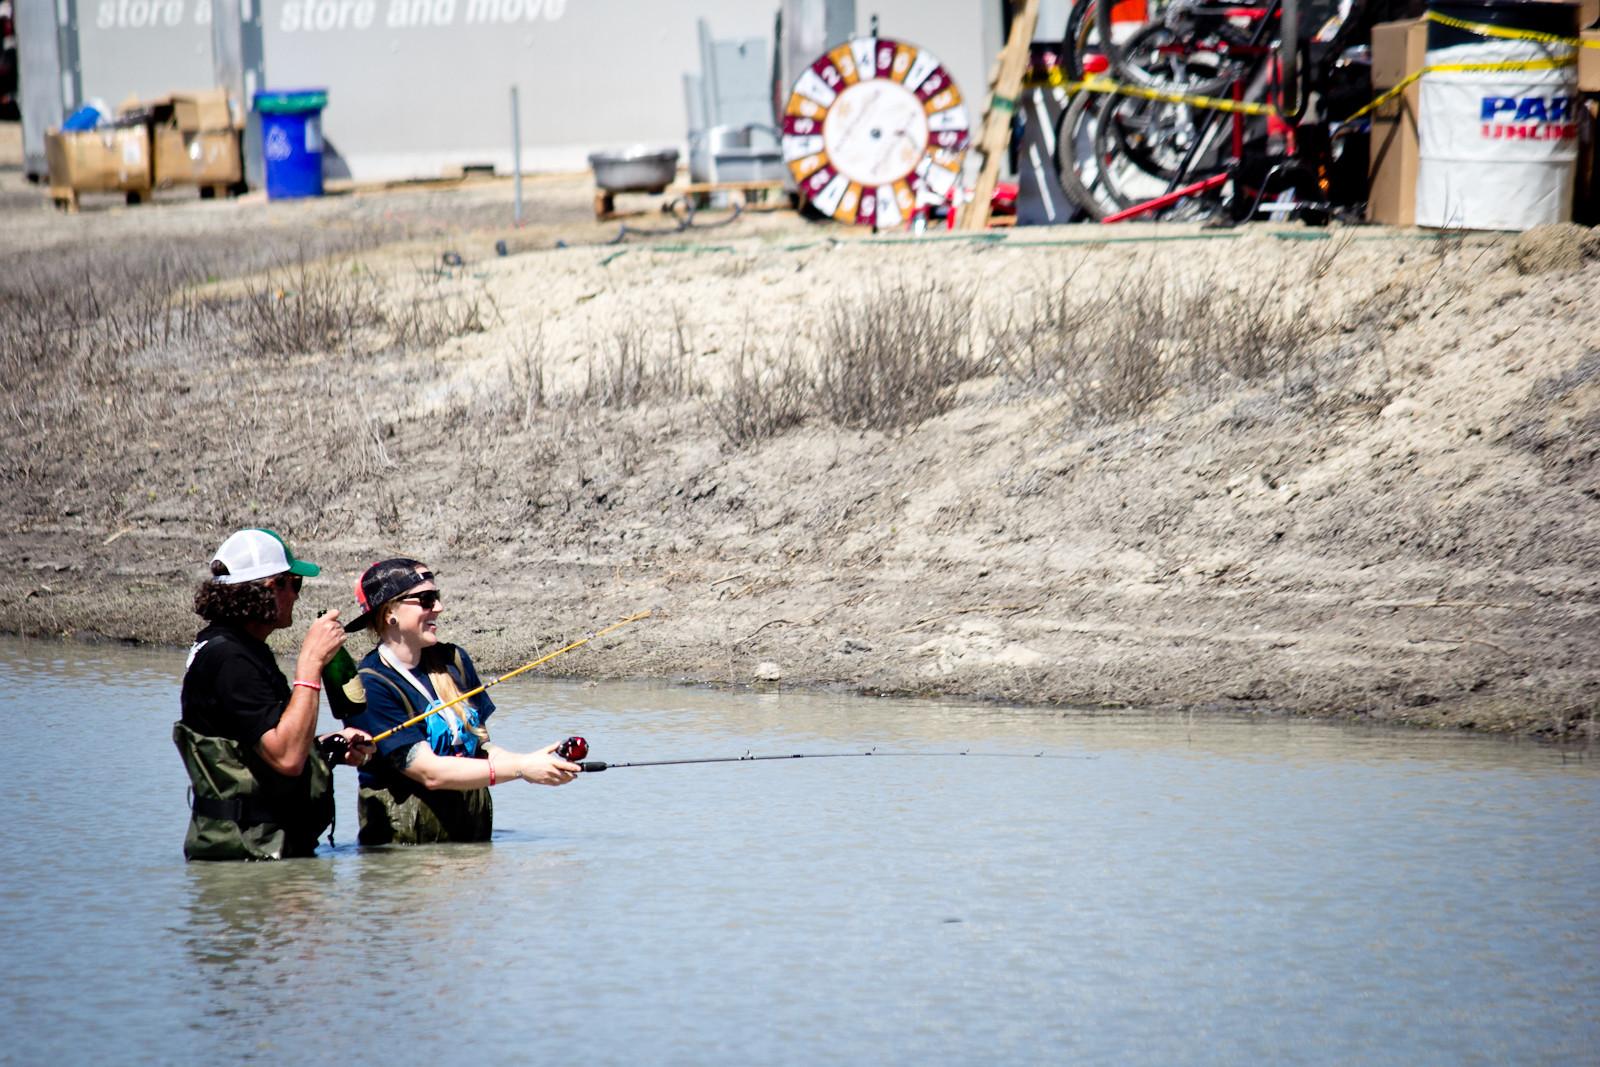 Pond Fishing - Sea Otter Classic - 2014 Sea Otter Classic Pit Bits - 3rd Edition - Mountain Biking Pictures - Vital MTB